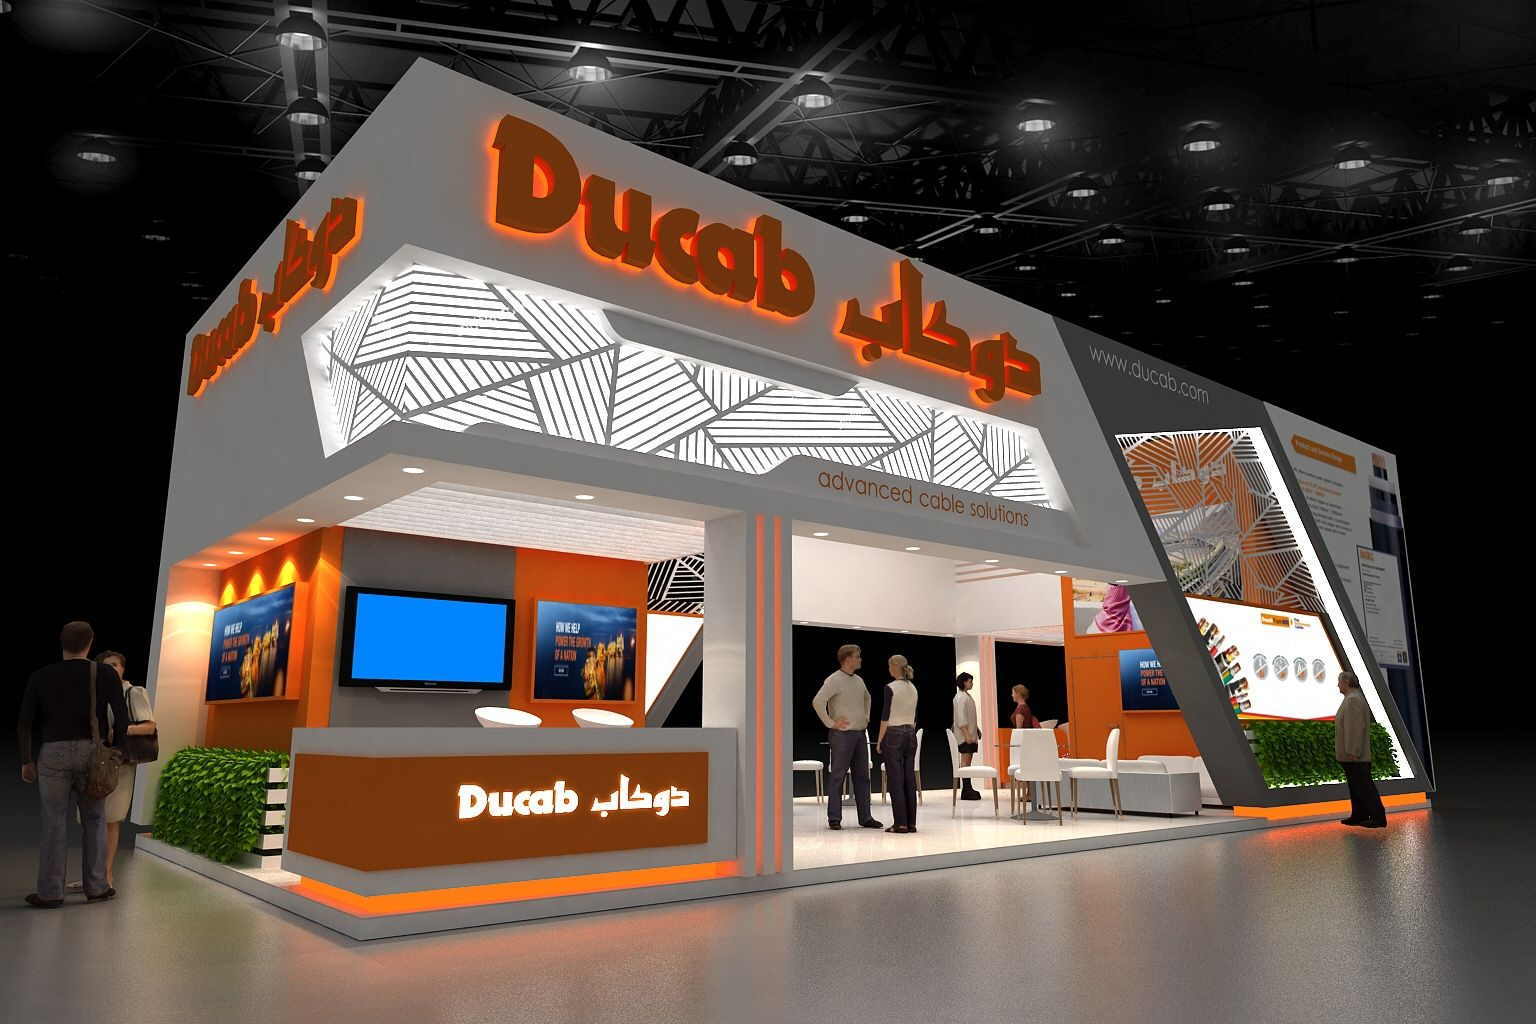 Creative Exhibition Stand Design : Exhibition booth design exhibition design exhibition stand